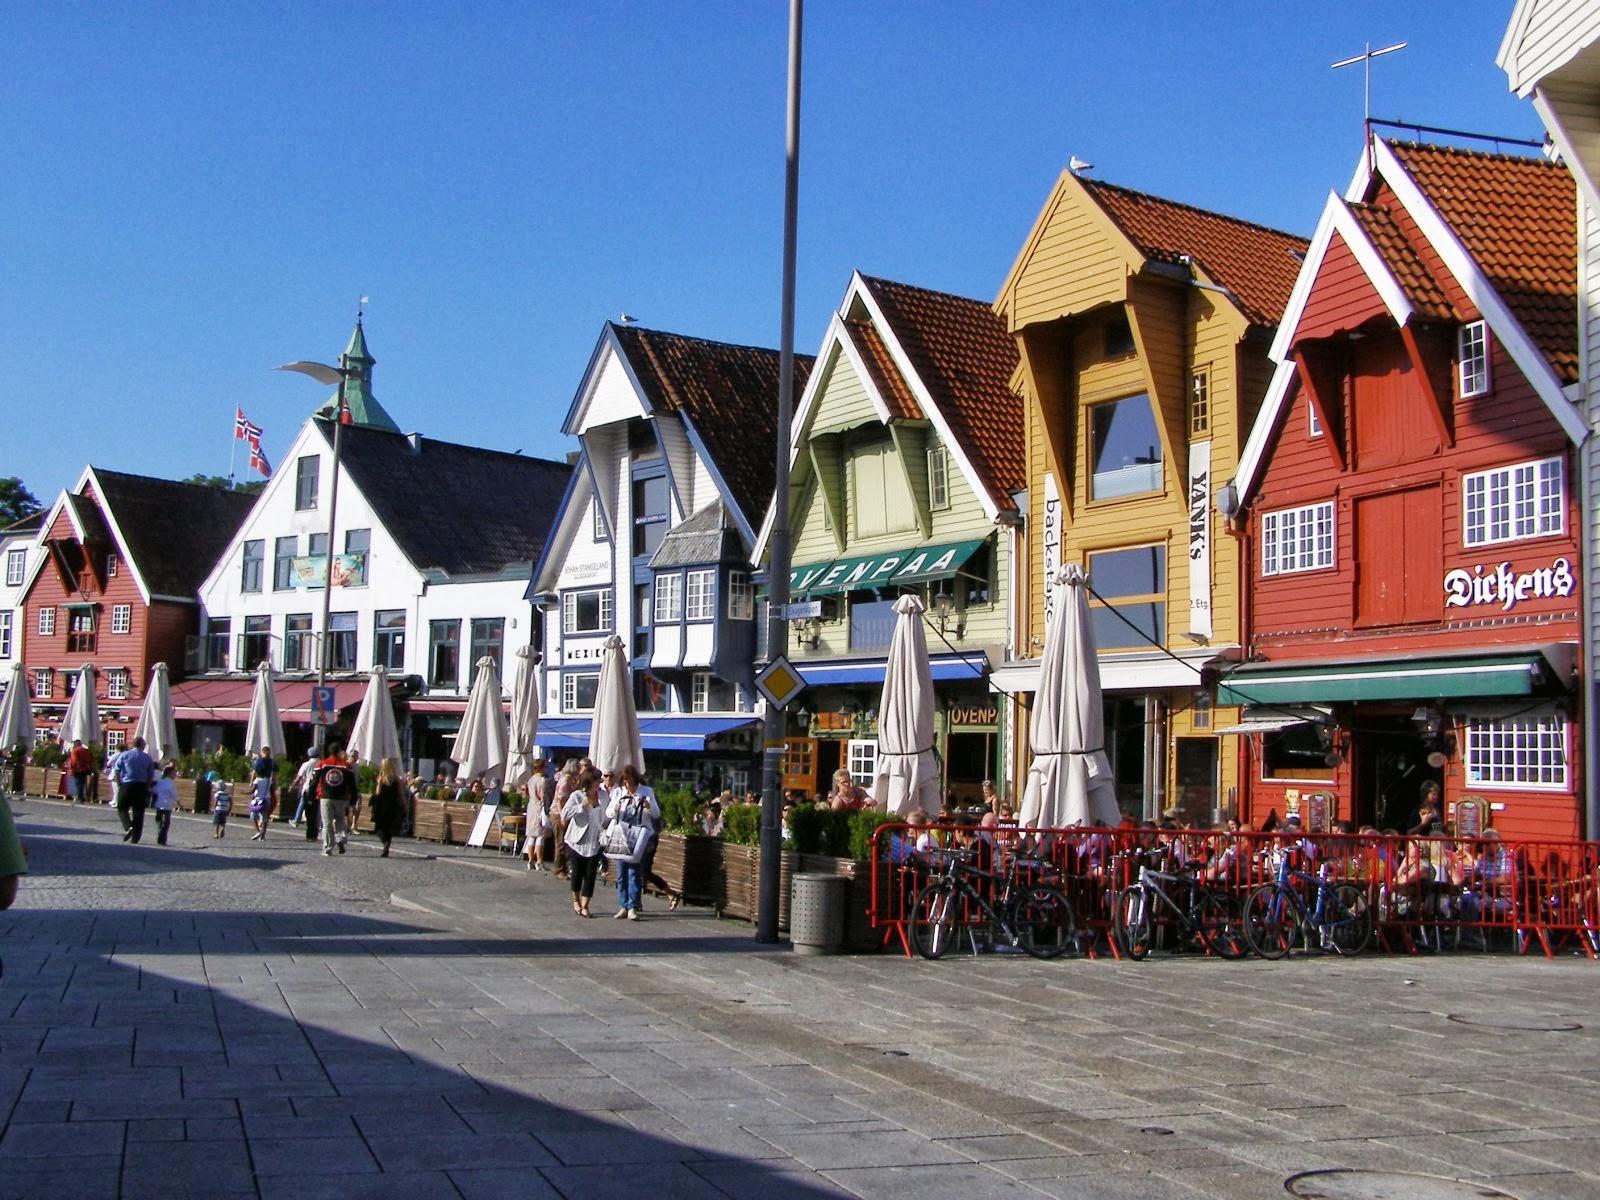 Norwegia – południe kraju iokolice Stavanger